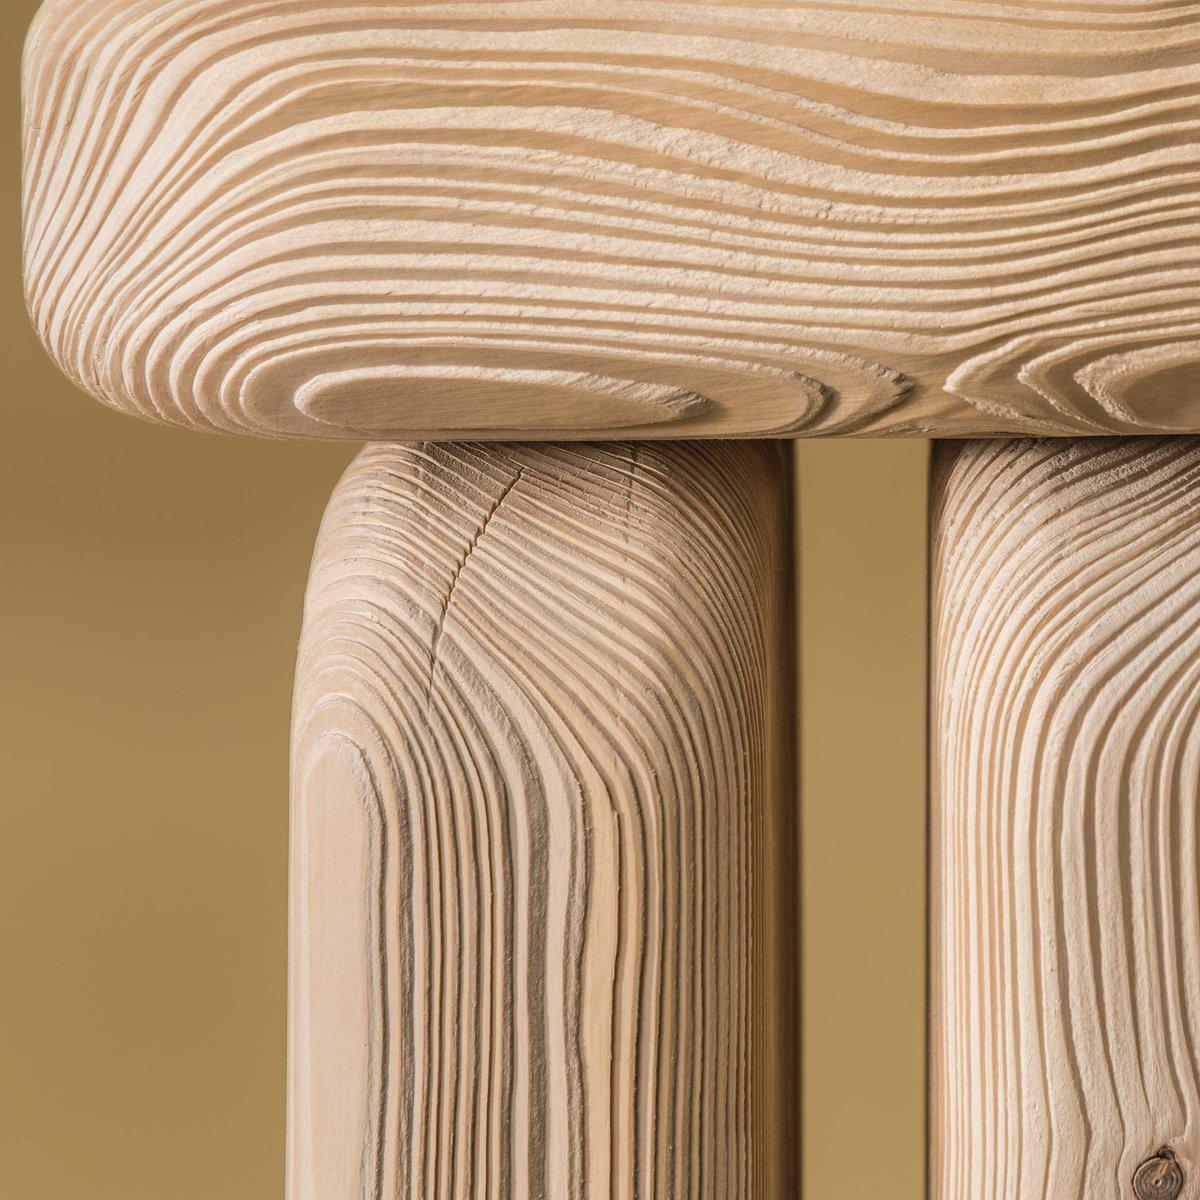 Dezeen On Twitter Sandblasting This Wood Furniture